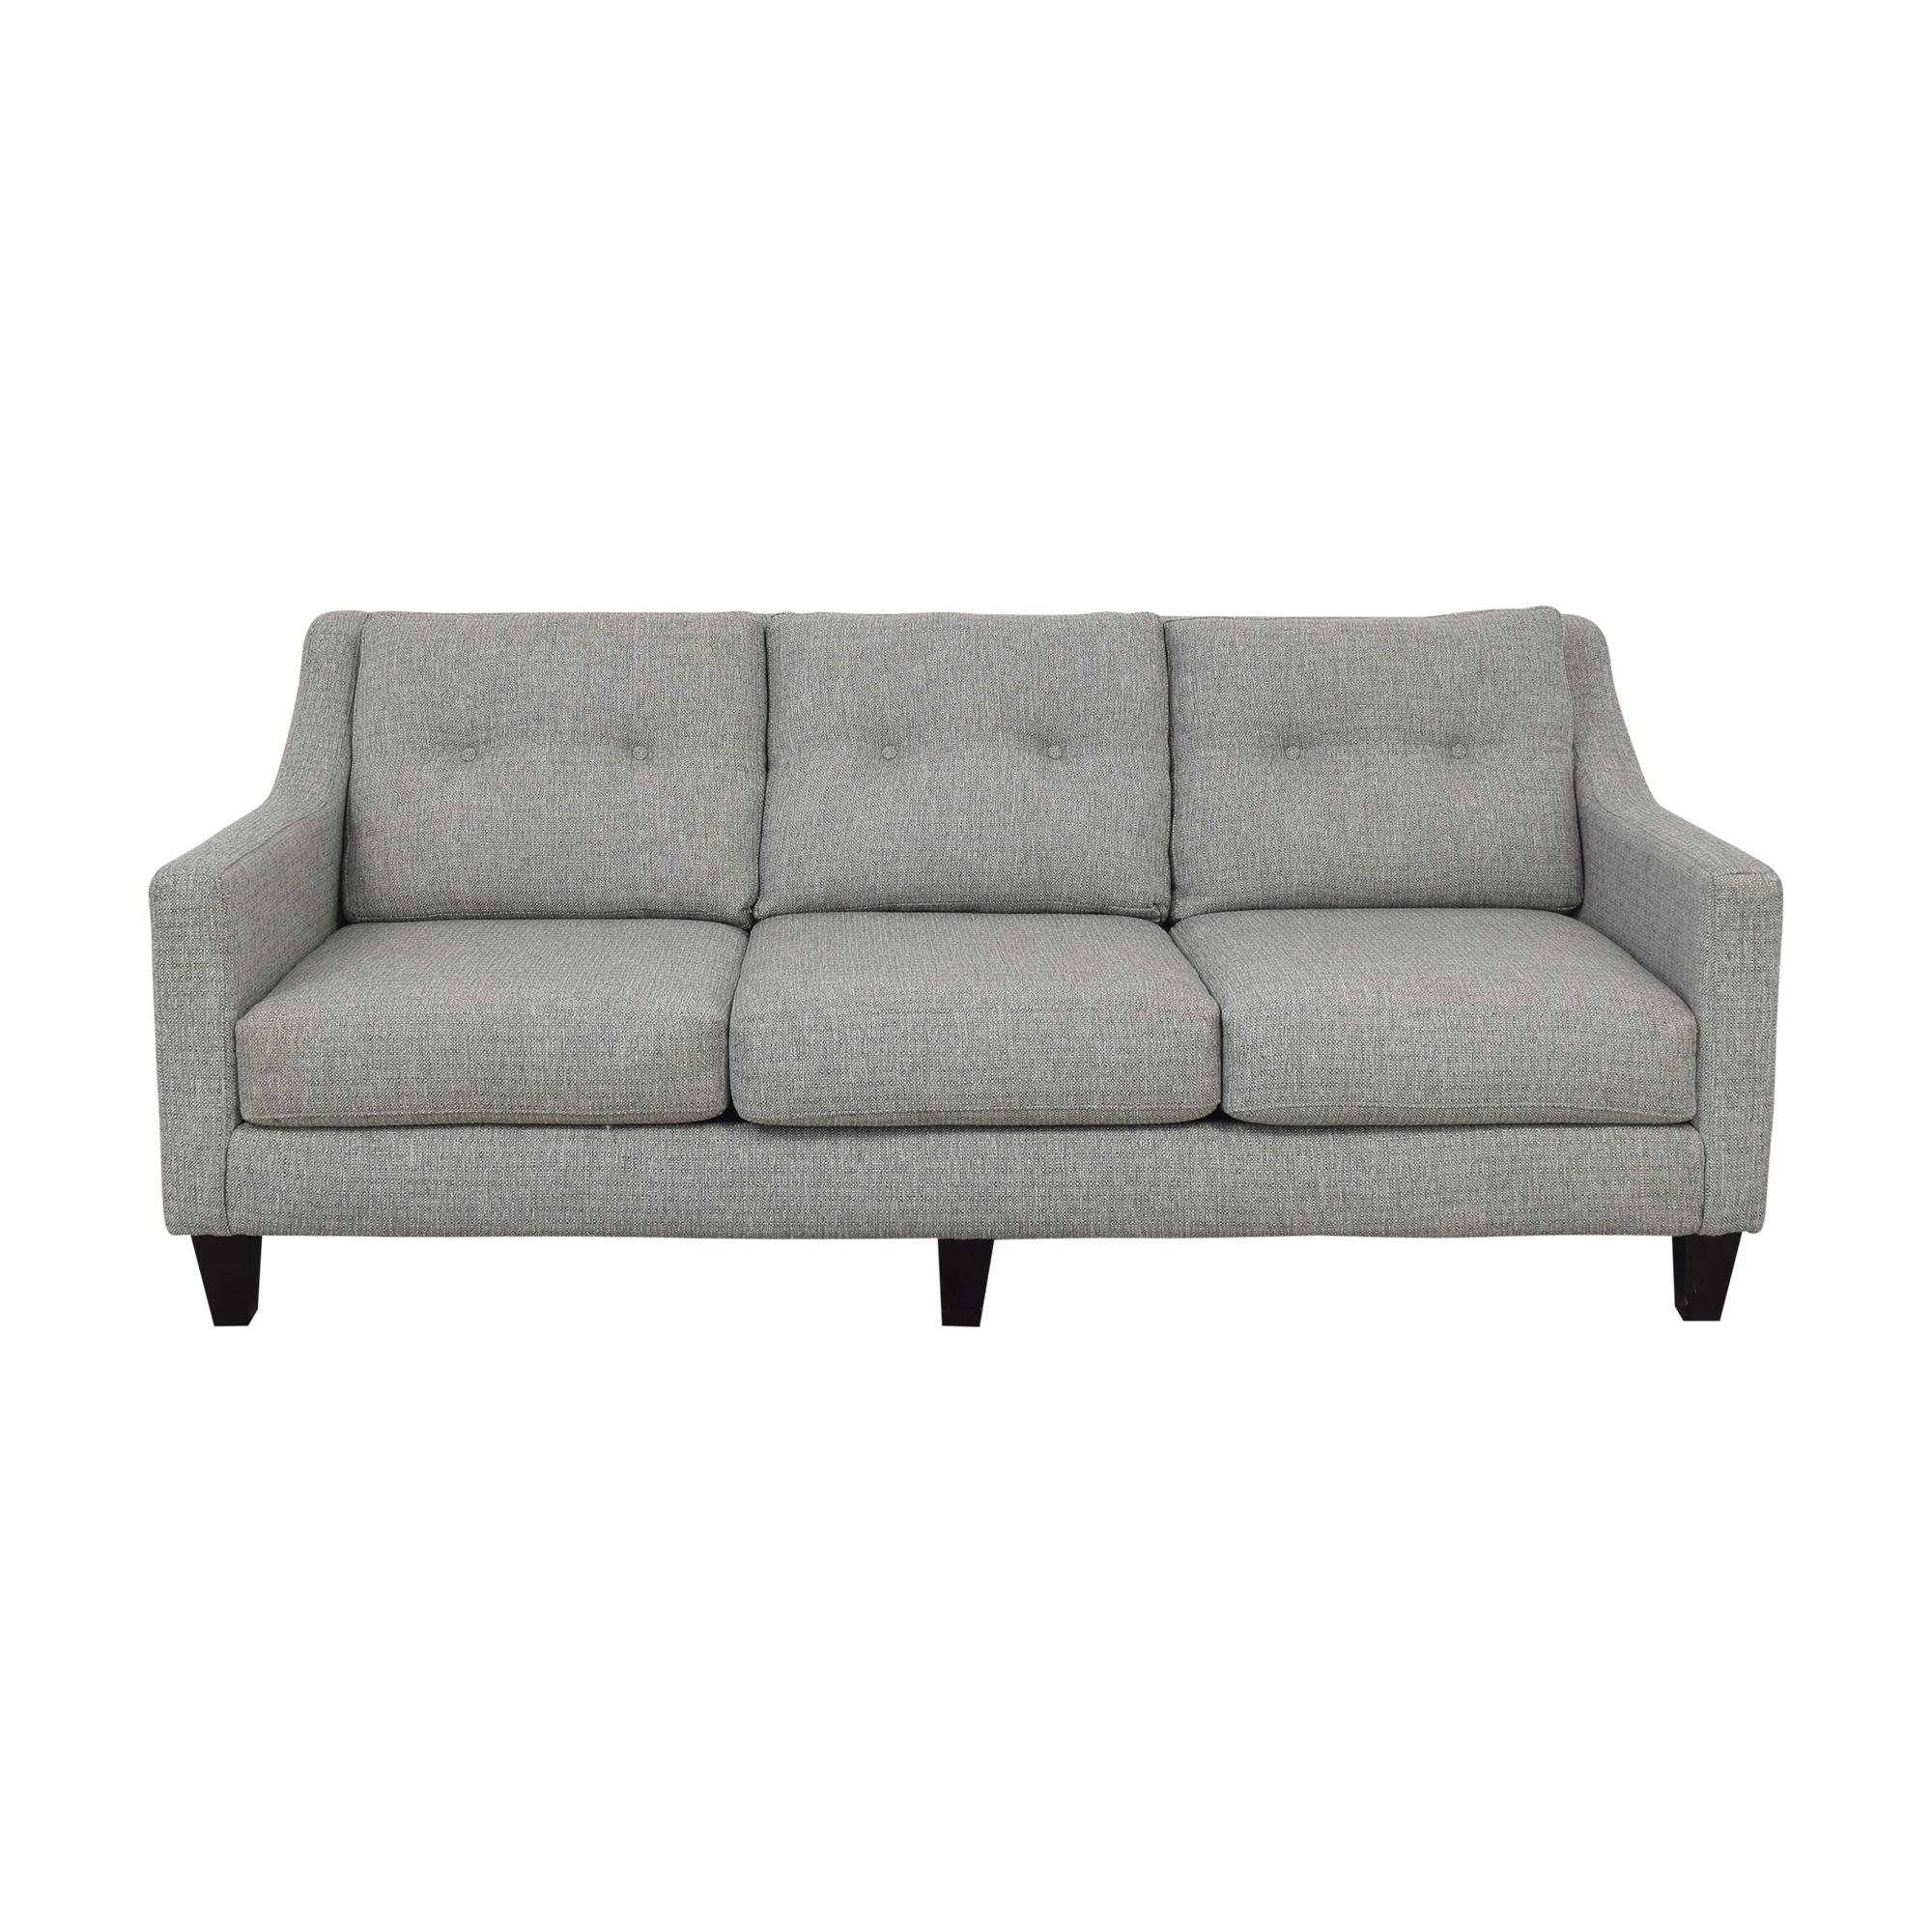 Raymour & Flanigan Raymour & Flanigan Three Seat Sofa price